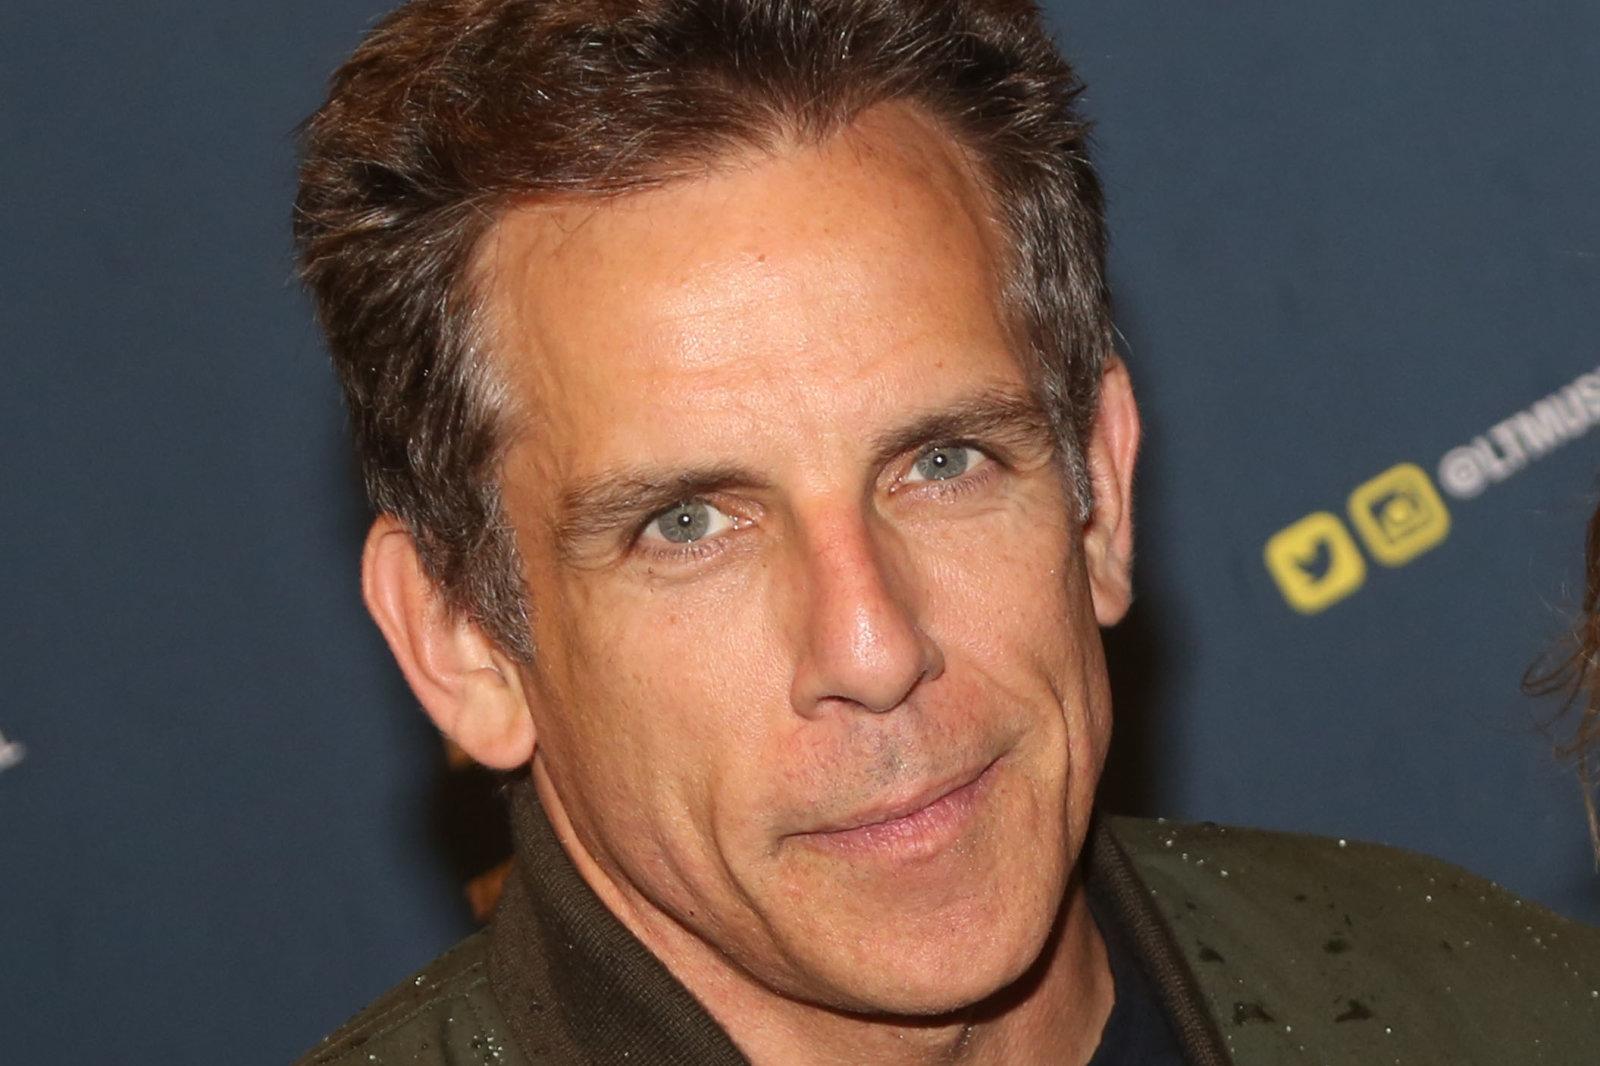 Apple orders Ben Stiller workplace drama starring Adam Scott | DeviceDaily.com